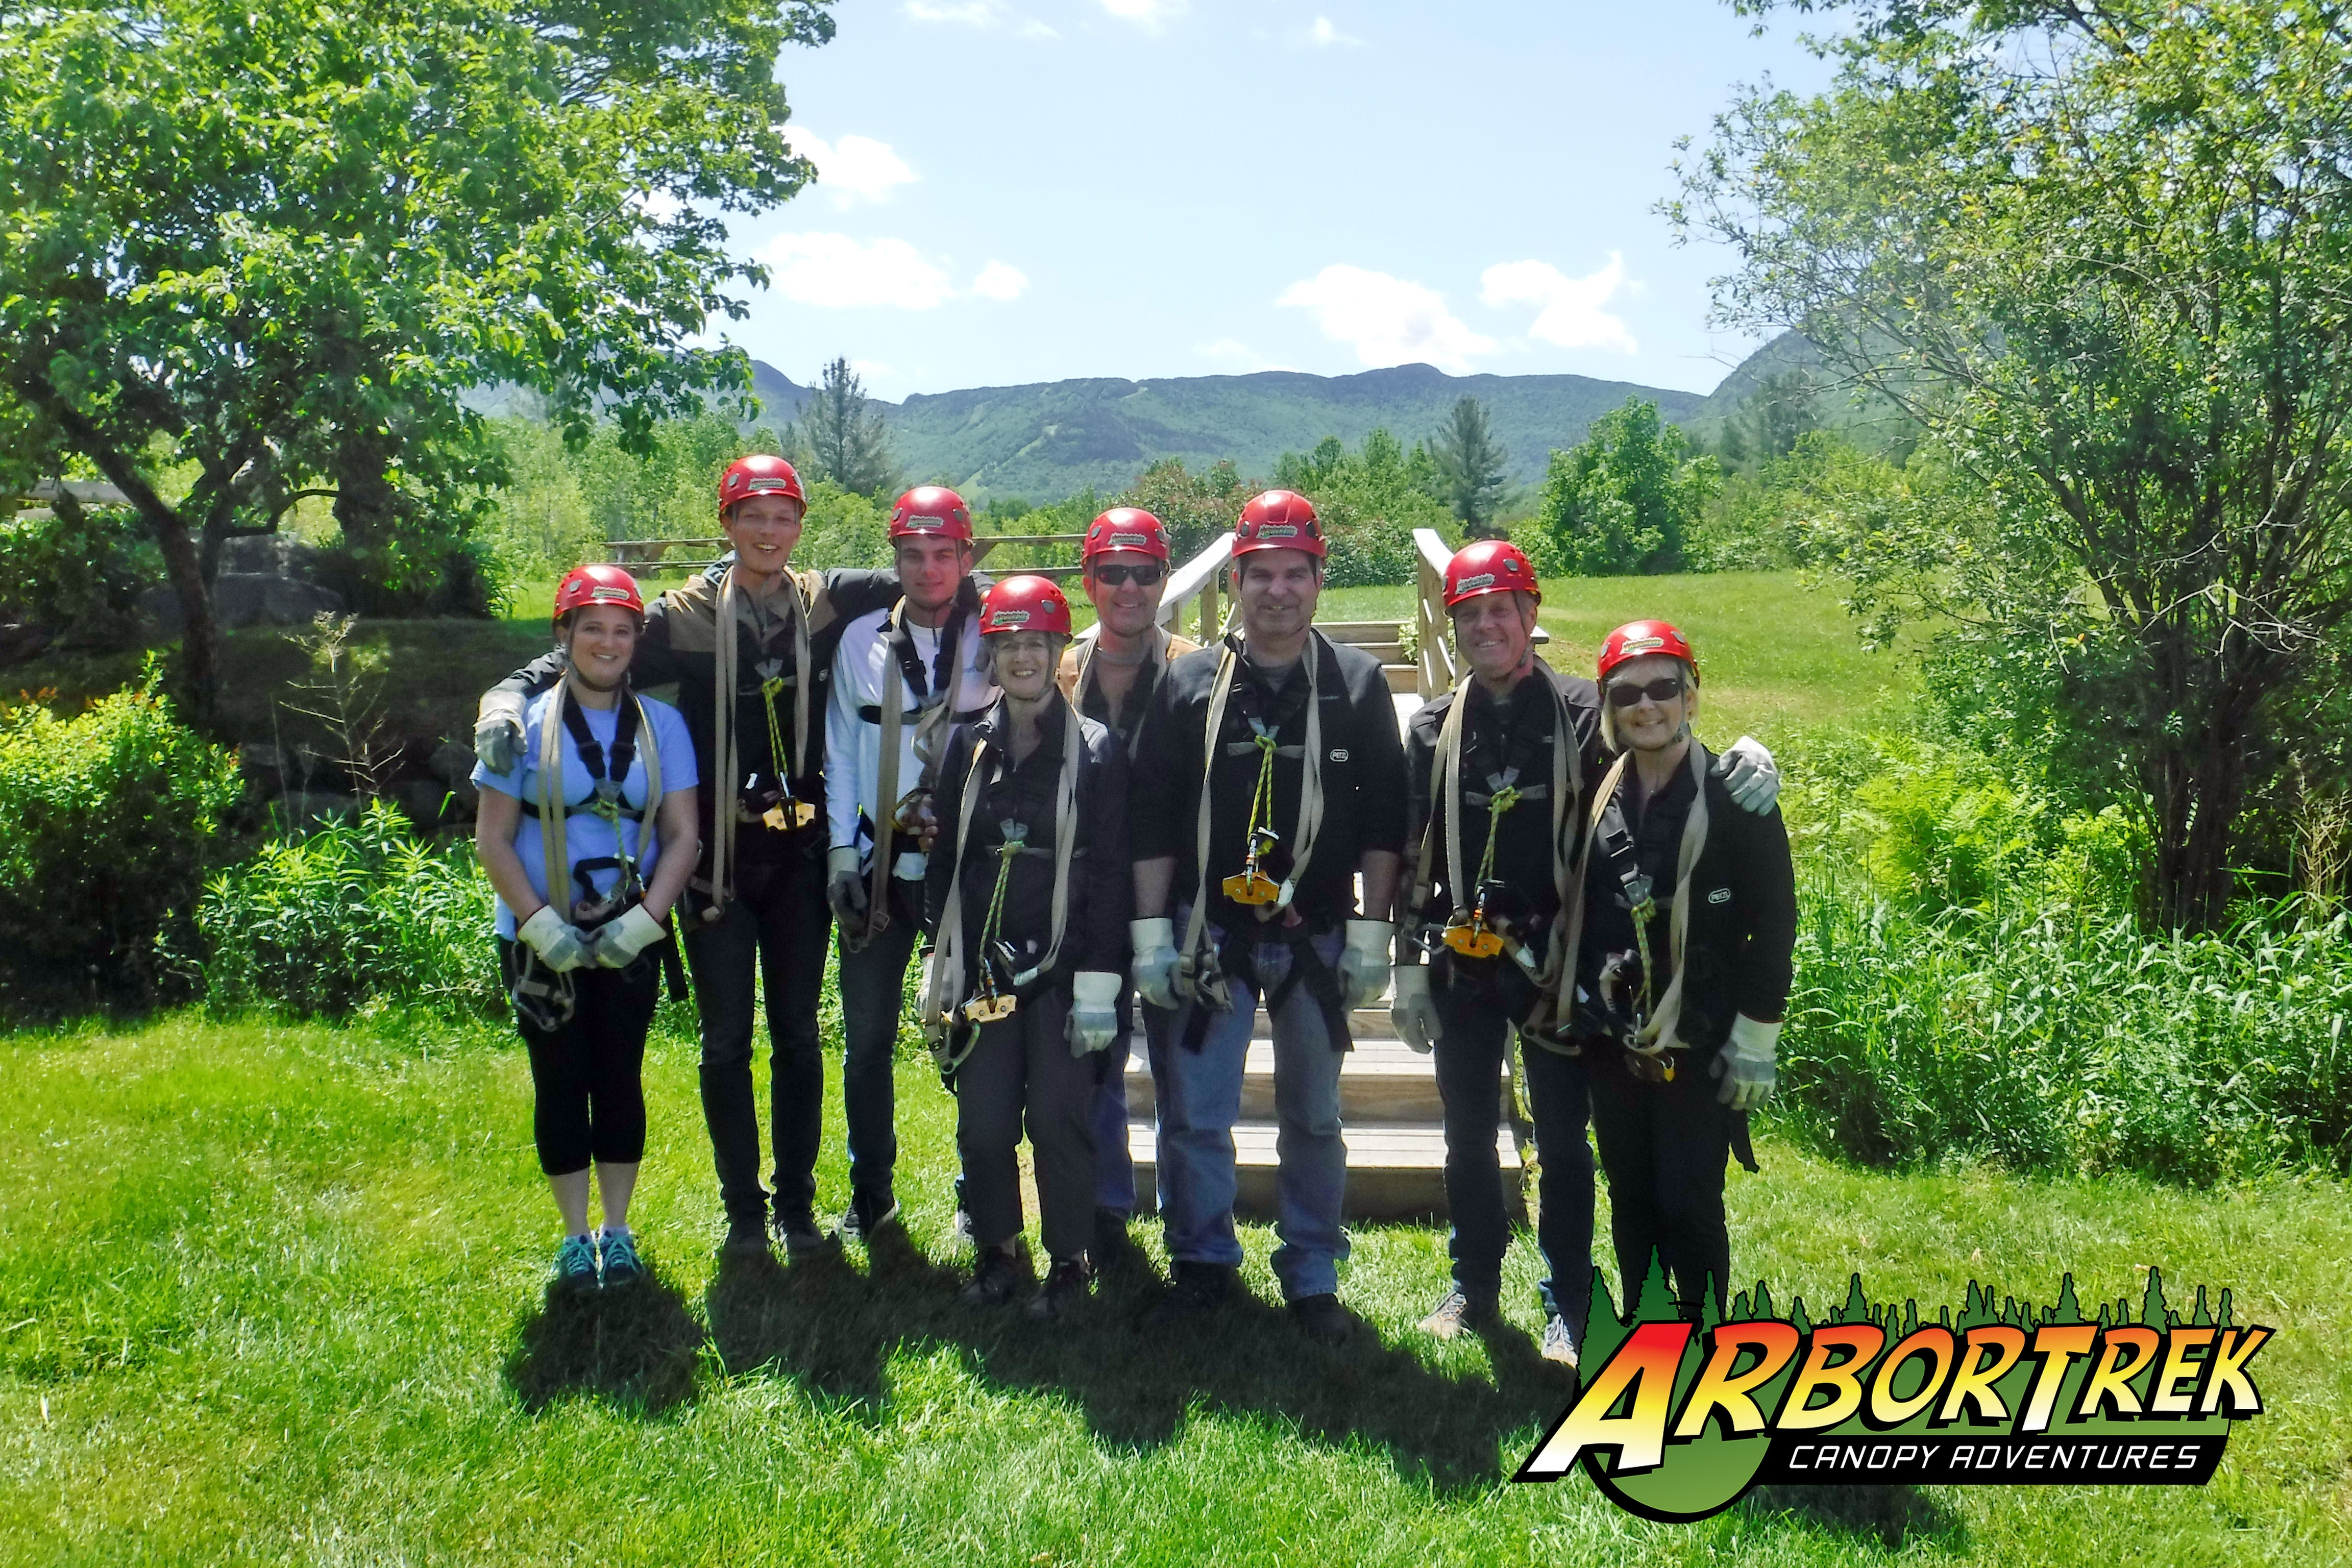 ArborTrek-Smugglers-Notch-2018-06-08 00-00-00-0001